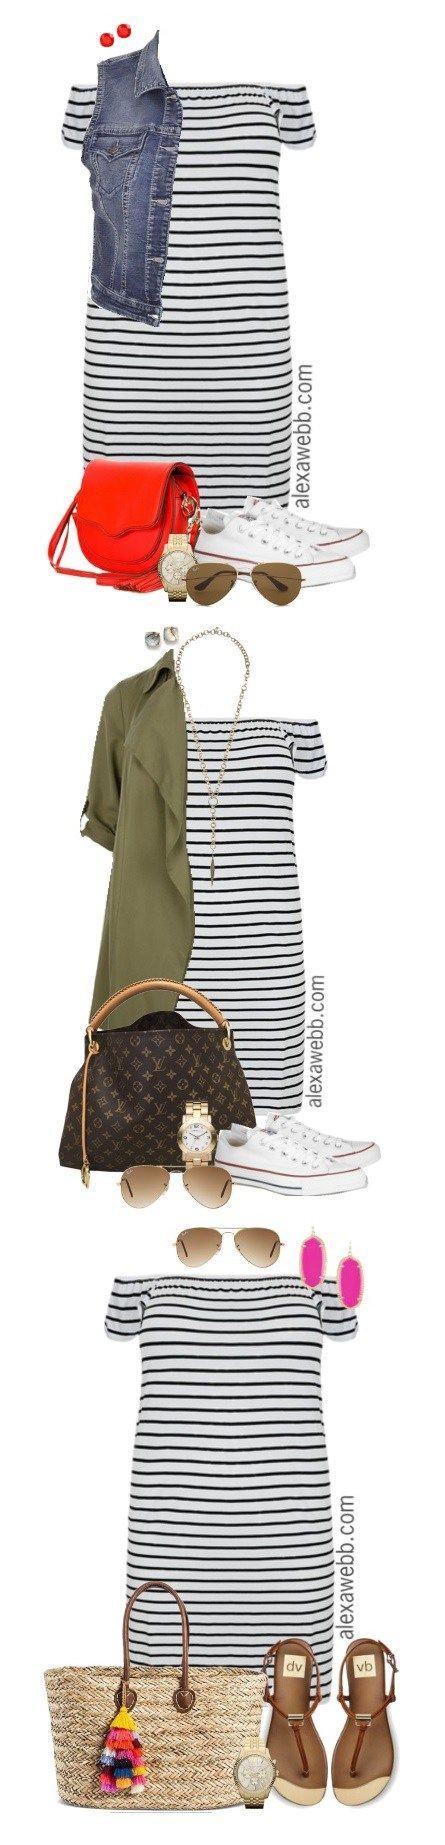 Plus Size Striped Dress Outfits - Plus Size Fashion - alexawebb.com